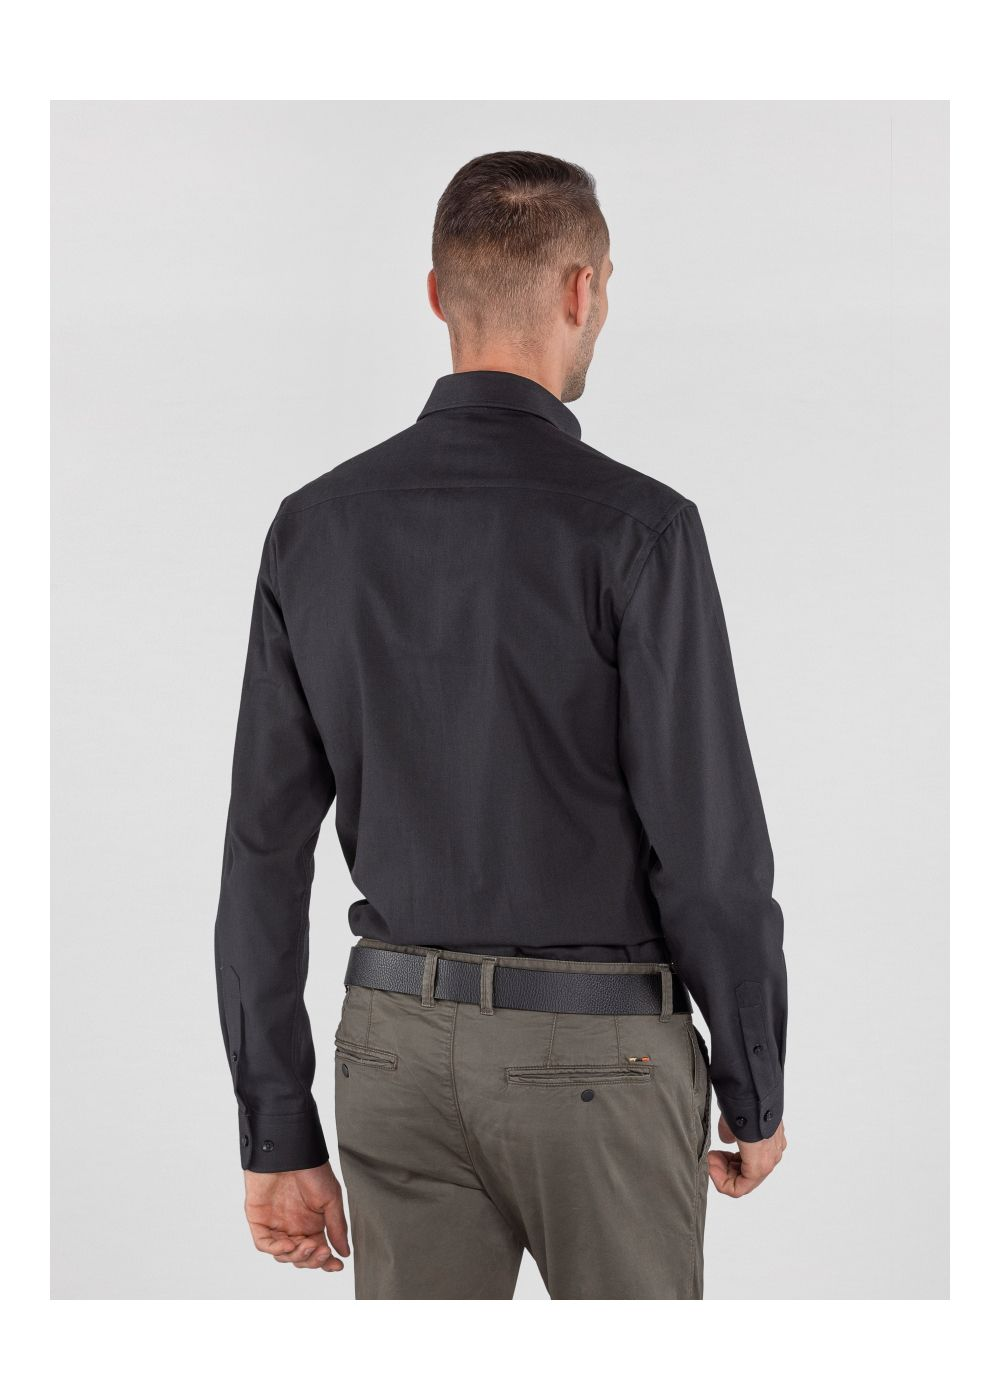 Koszula męska KOSMT-0227-99(Z20)